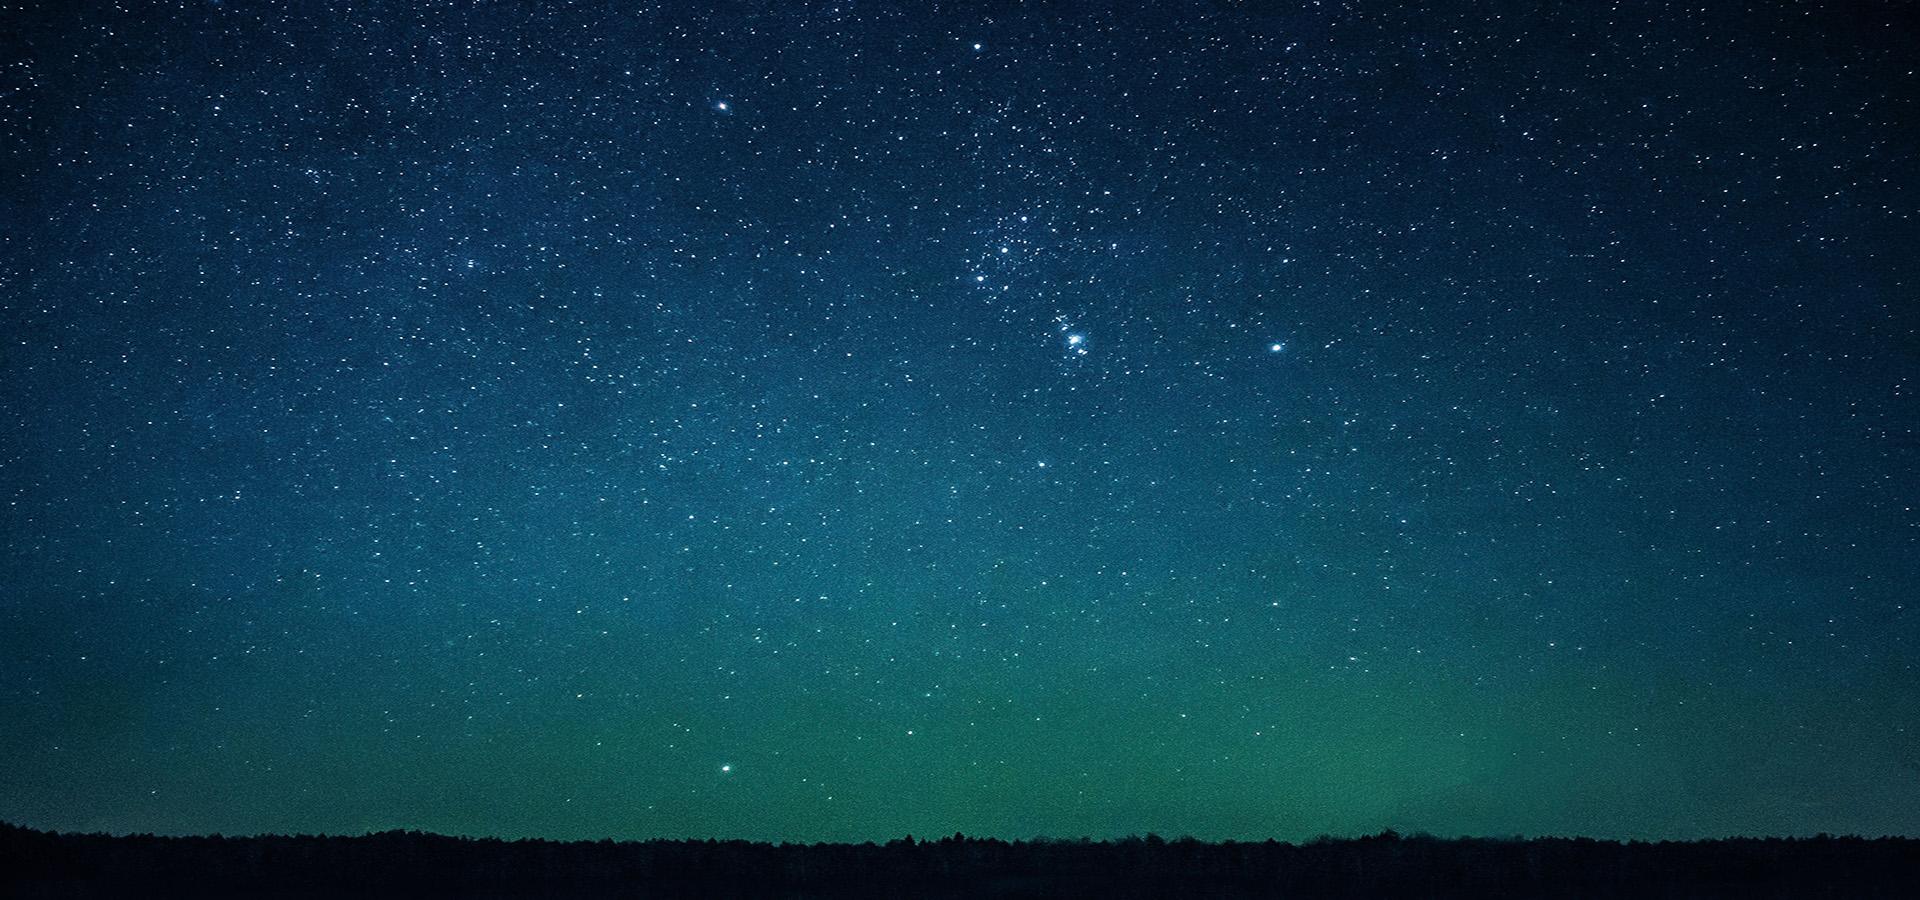 star corps c u00e9leste l u0026 39 espace les  u00e9toiles contexte galaxie